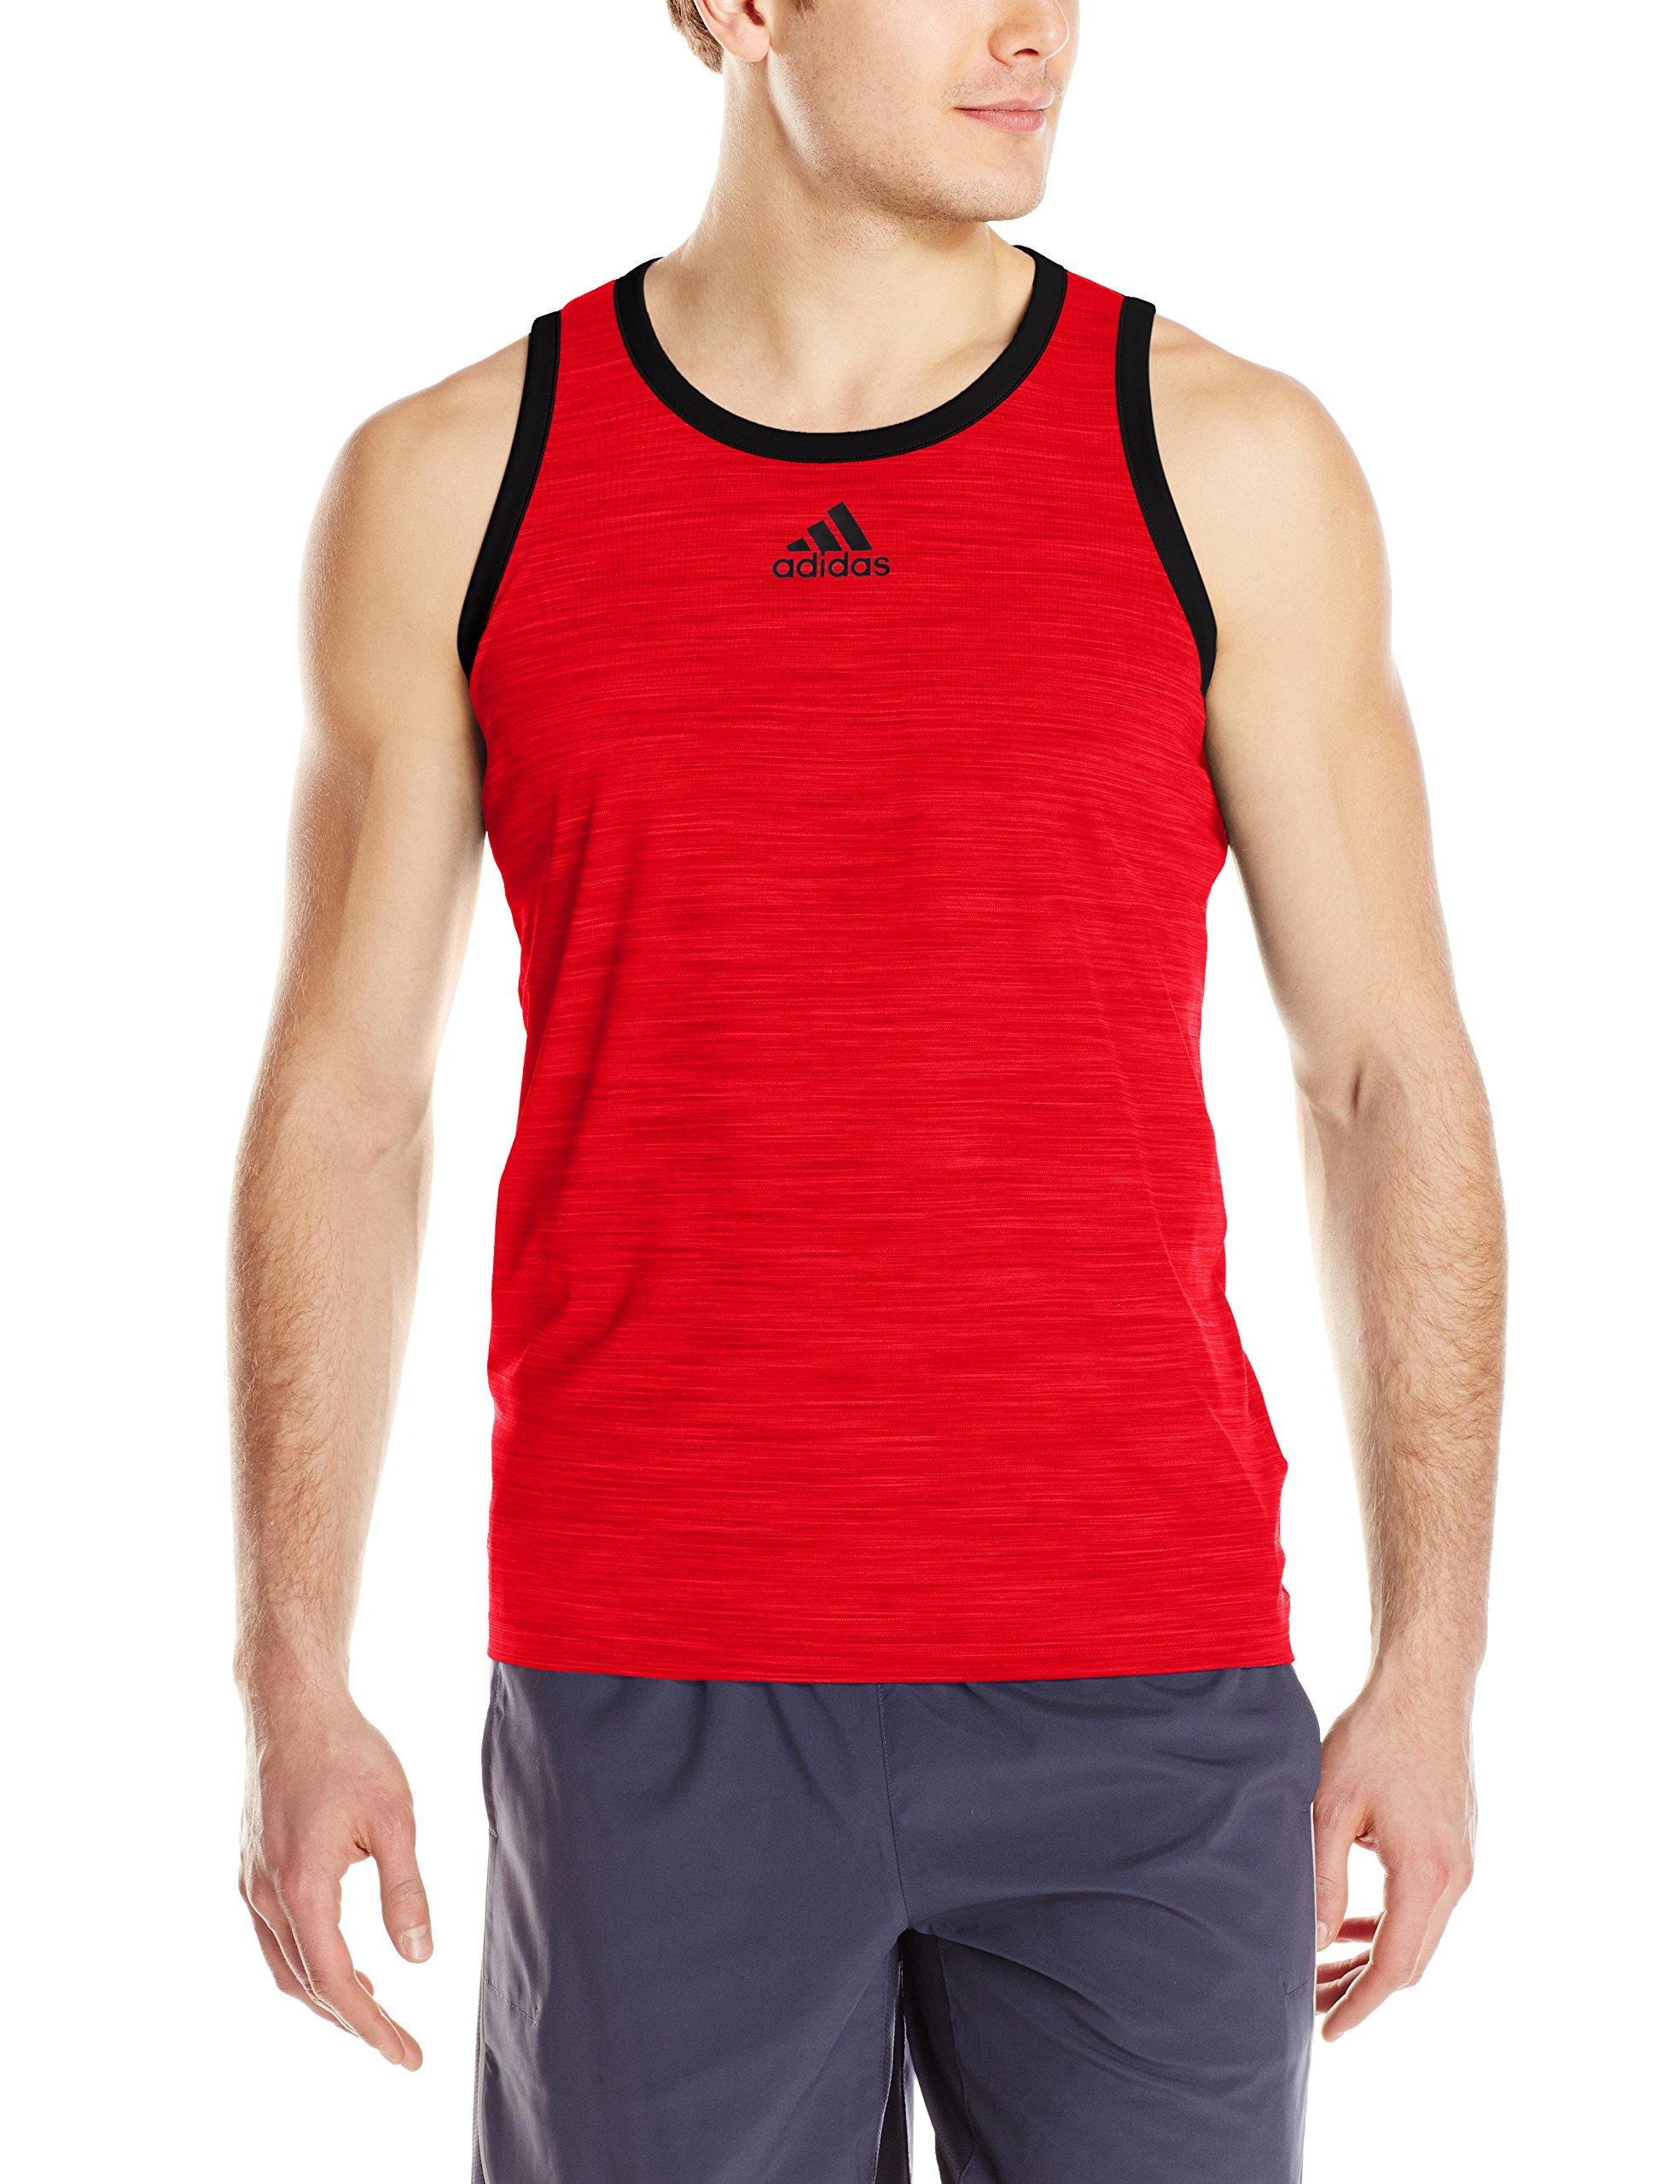 764b45a1428ee Galleon - Adidas Men s Basketball Heathered Tank Top